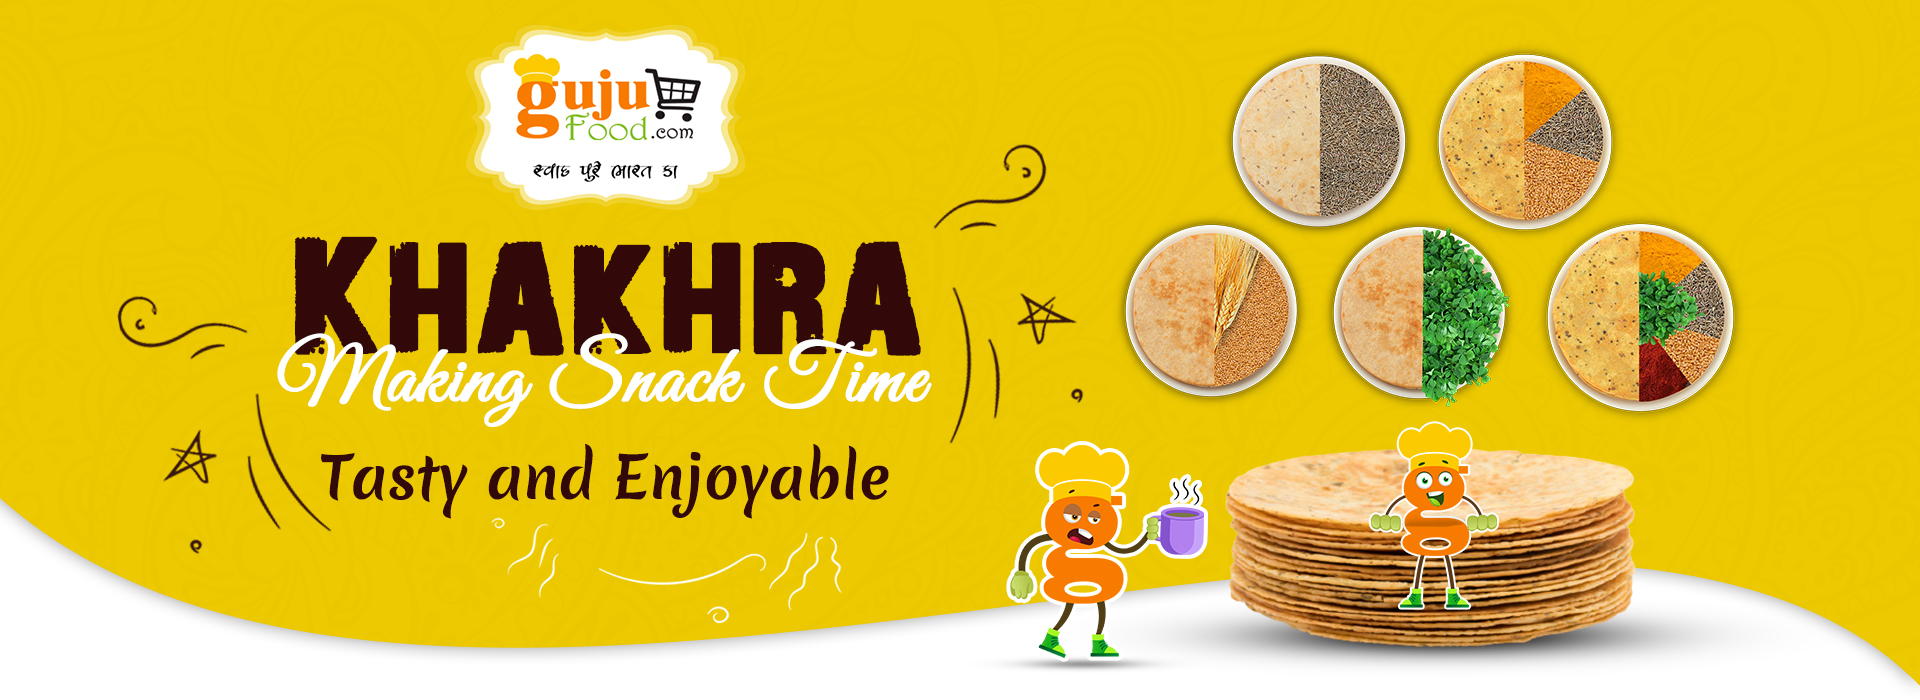 Gujufood Special Khakhra